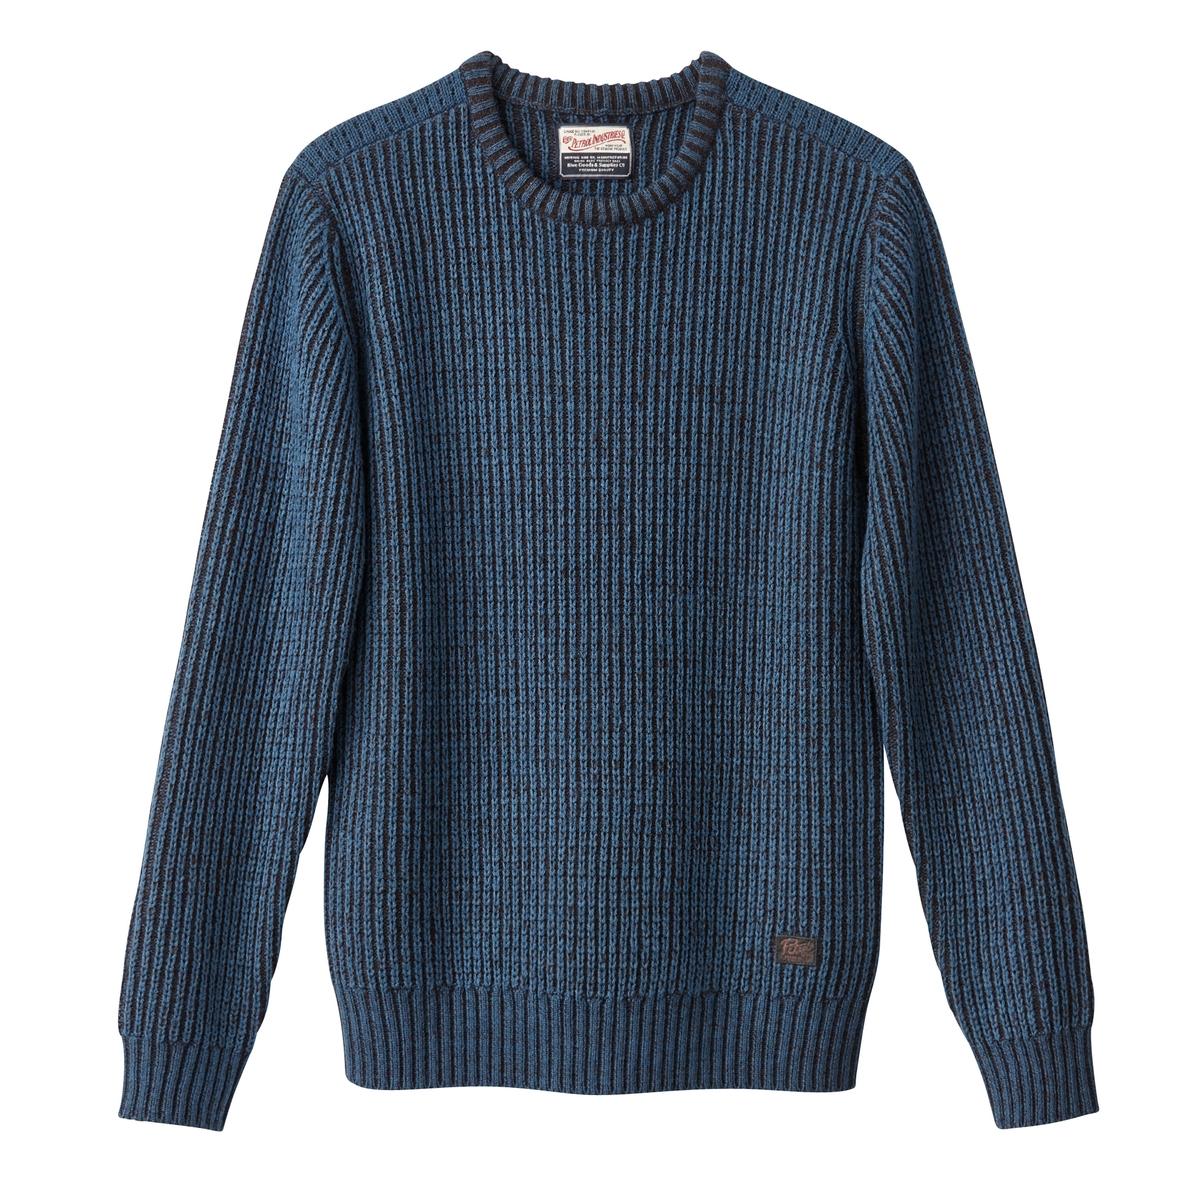 Пуловер крупной вязки